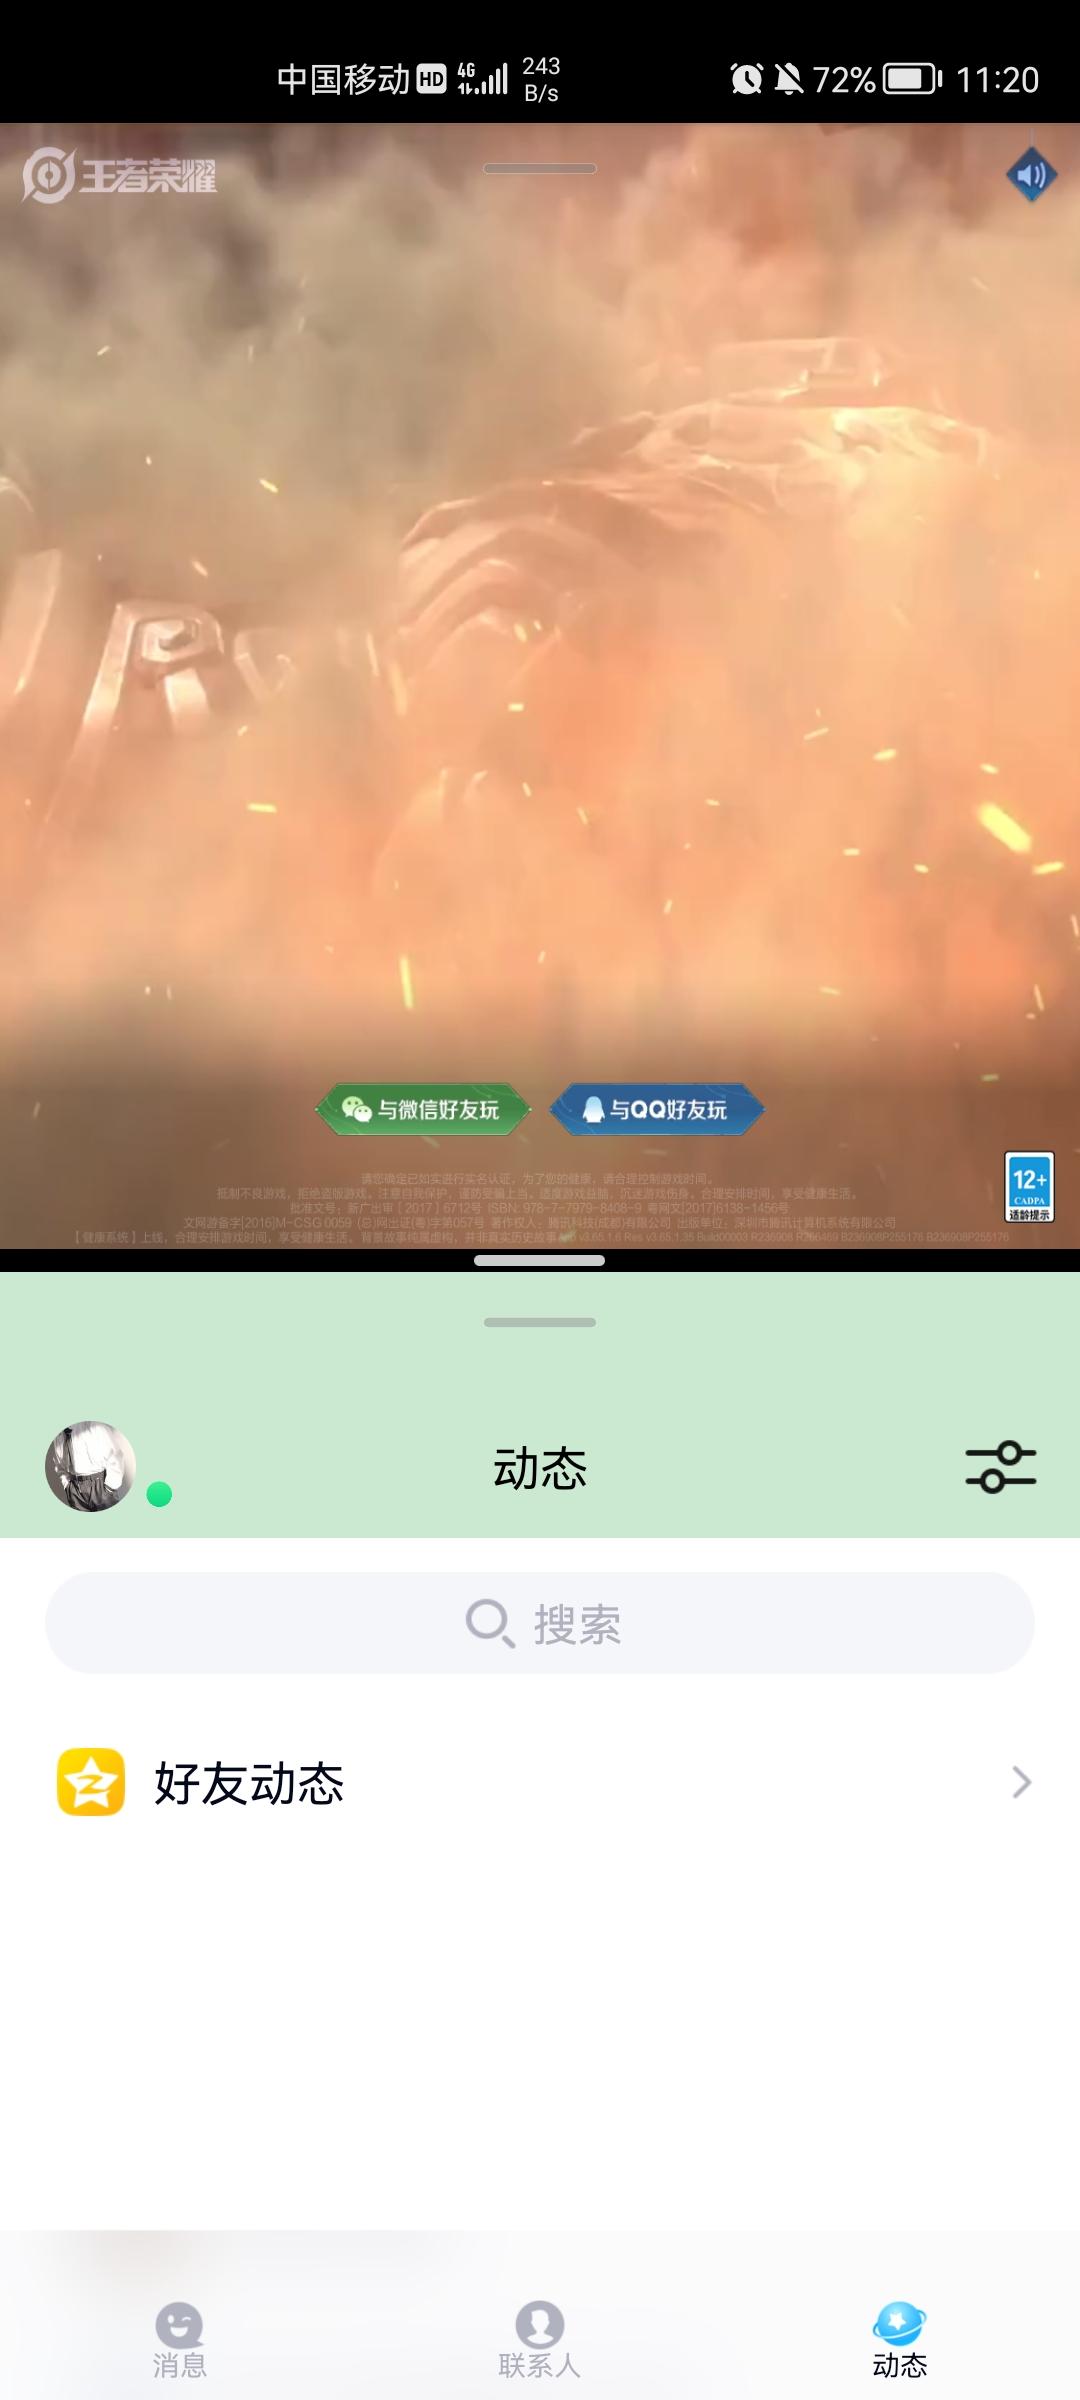 Screenshot_20210814_232056_com.tencent.tmgp.sgame.jpg